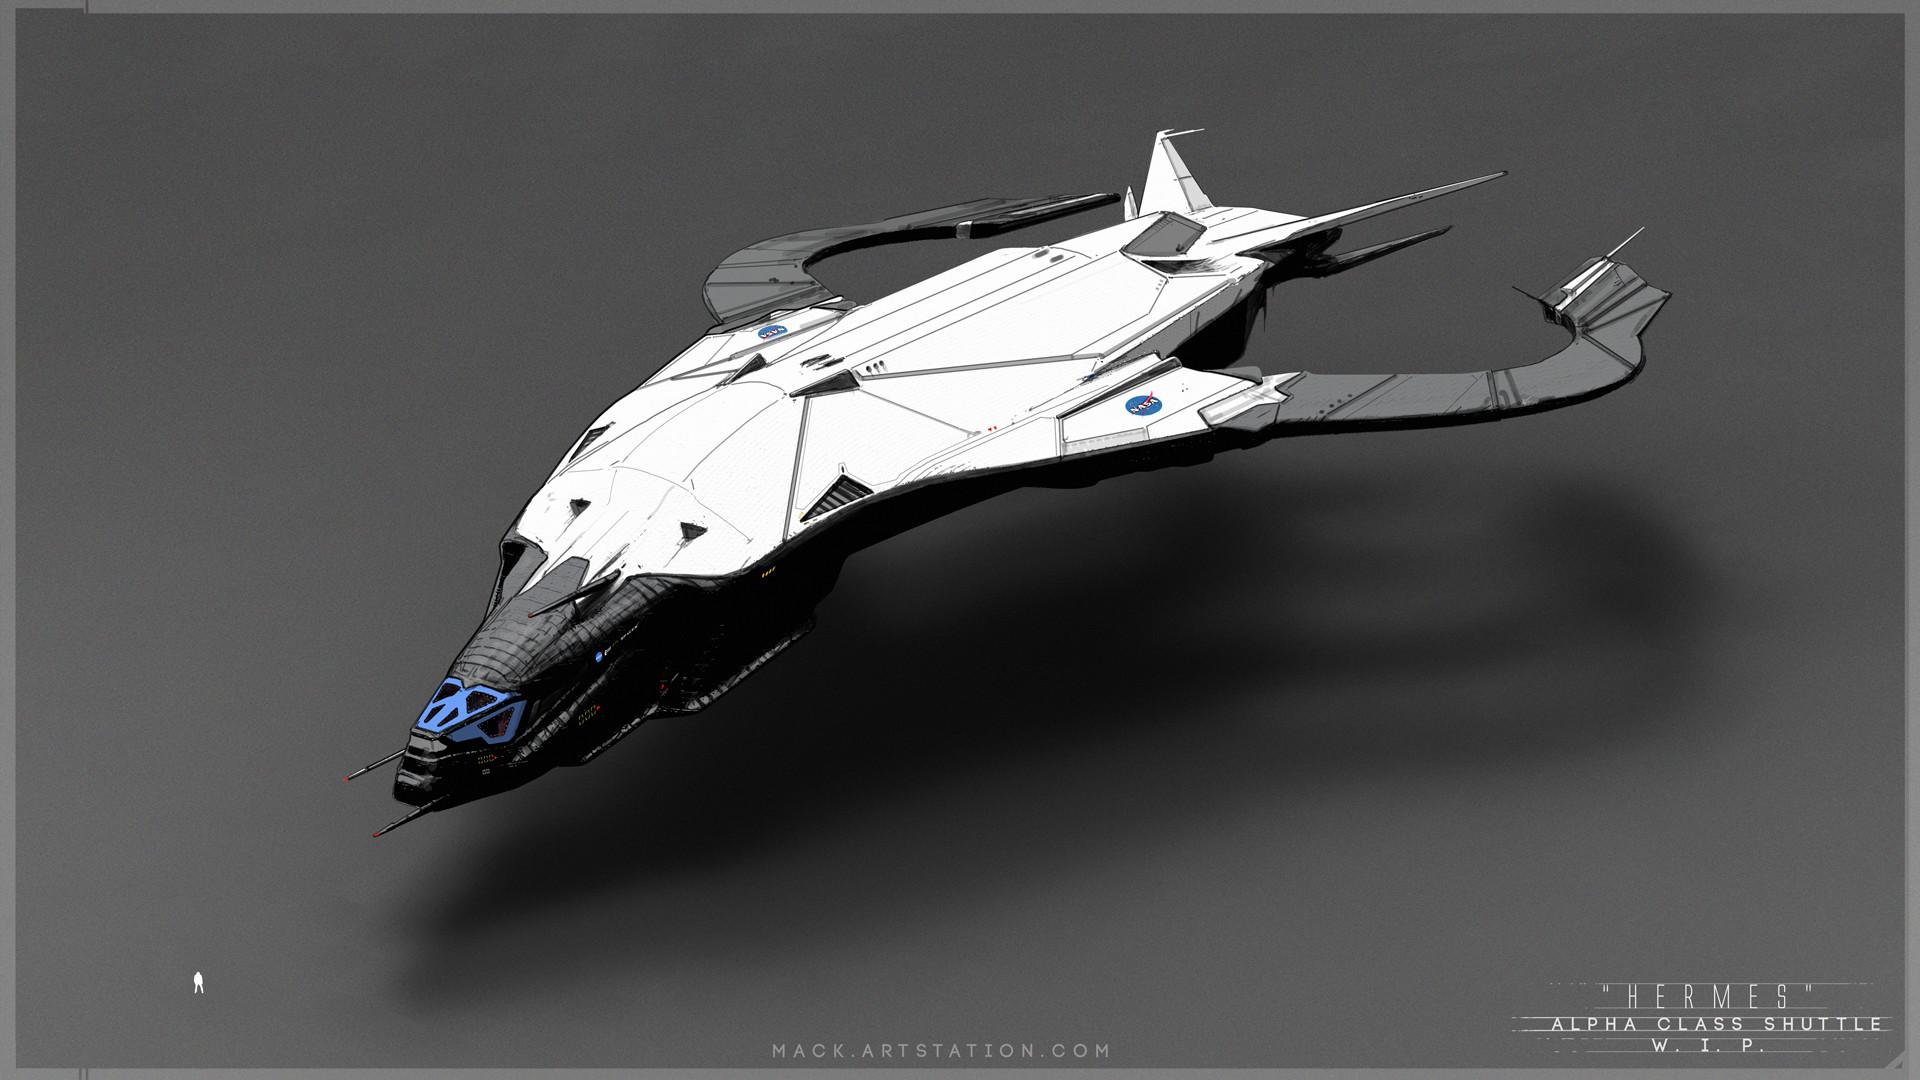 Mack sztaba orion class shuttle